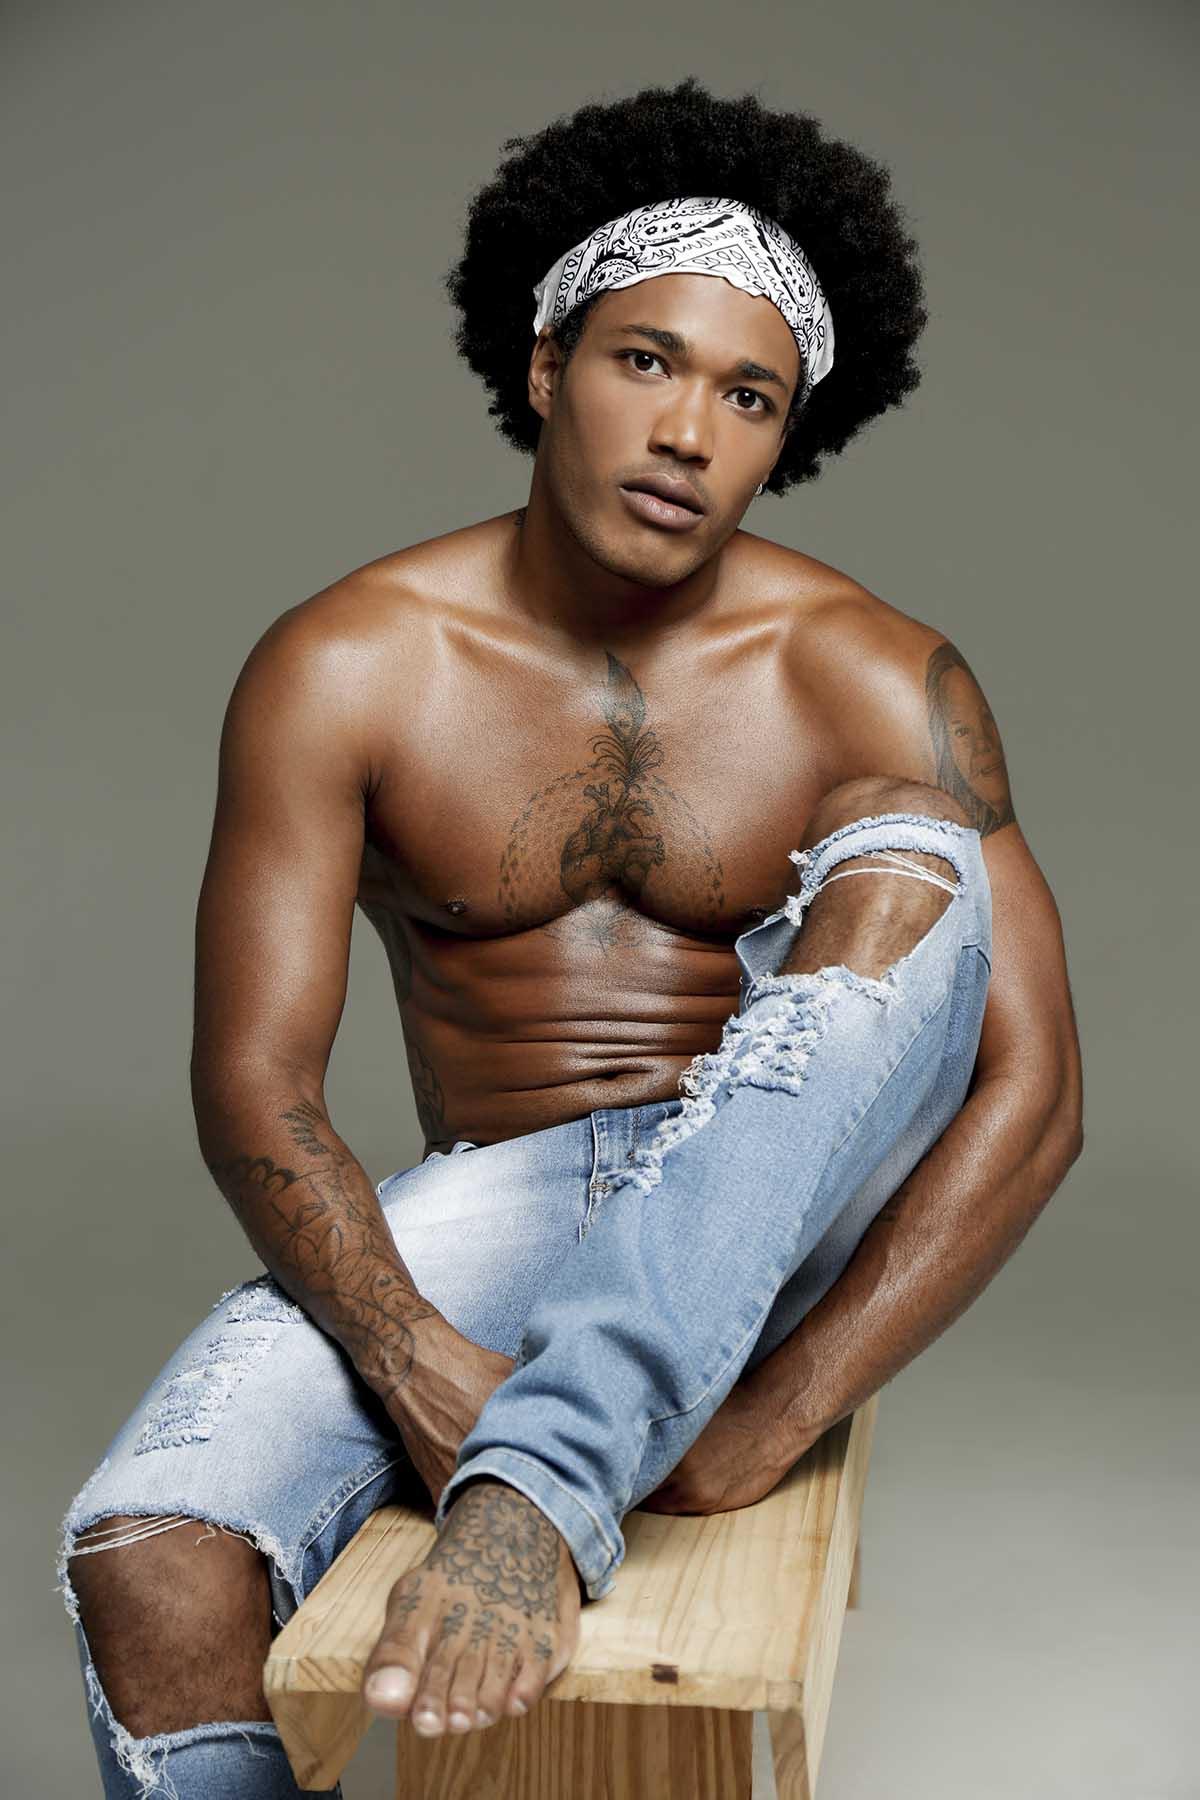 Vinicius Soares by Fabio Pamplona for Brazilian Male Model